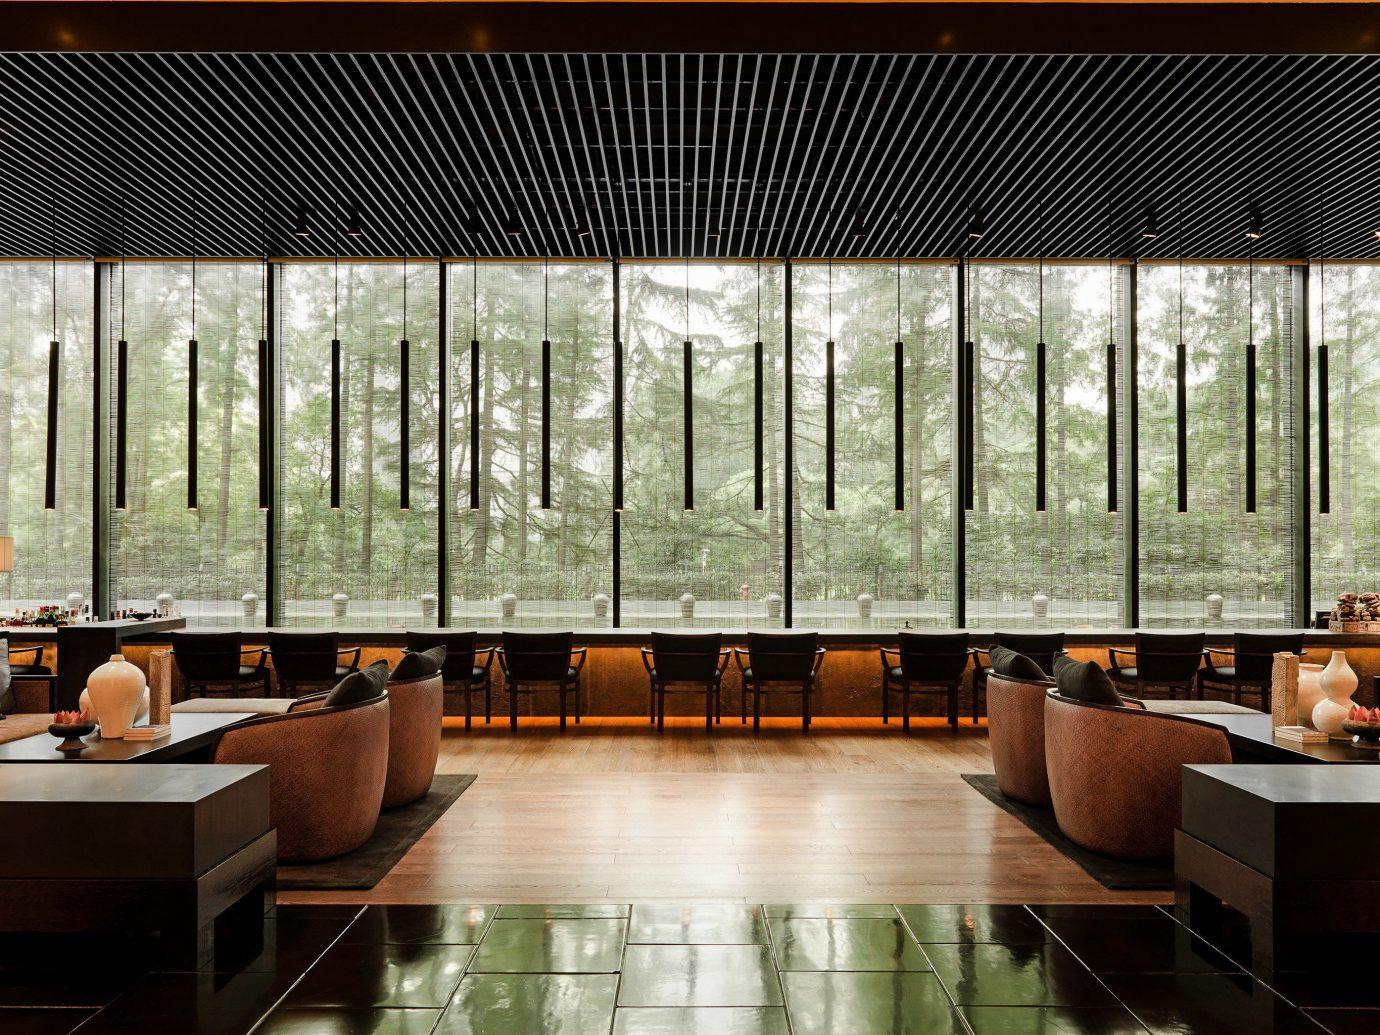 Boutique Hotels Luxury Travel Lobby indoor Architecture interior design ceiling daylighting building facade condominium several